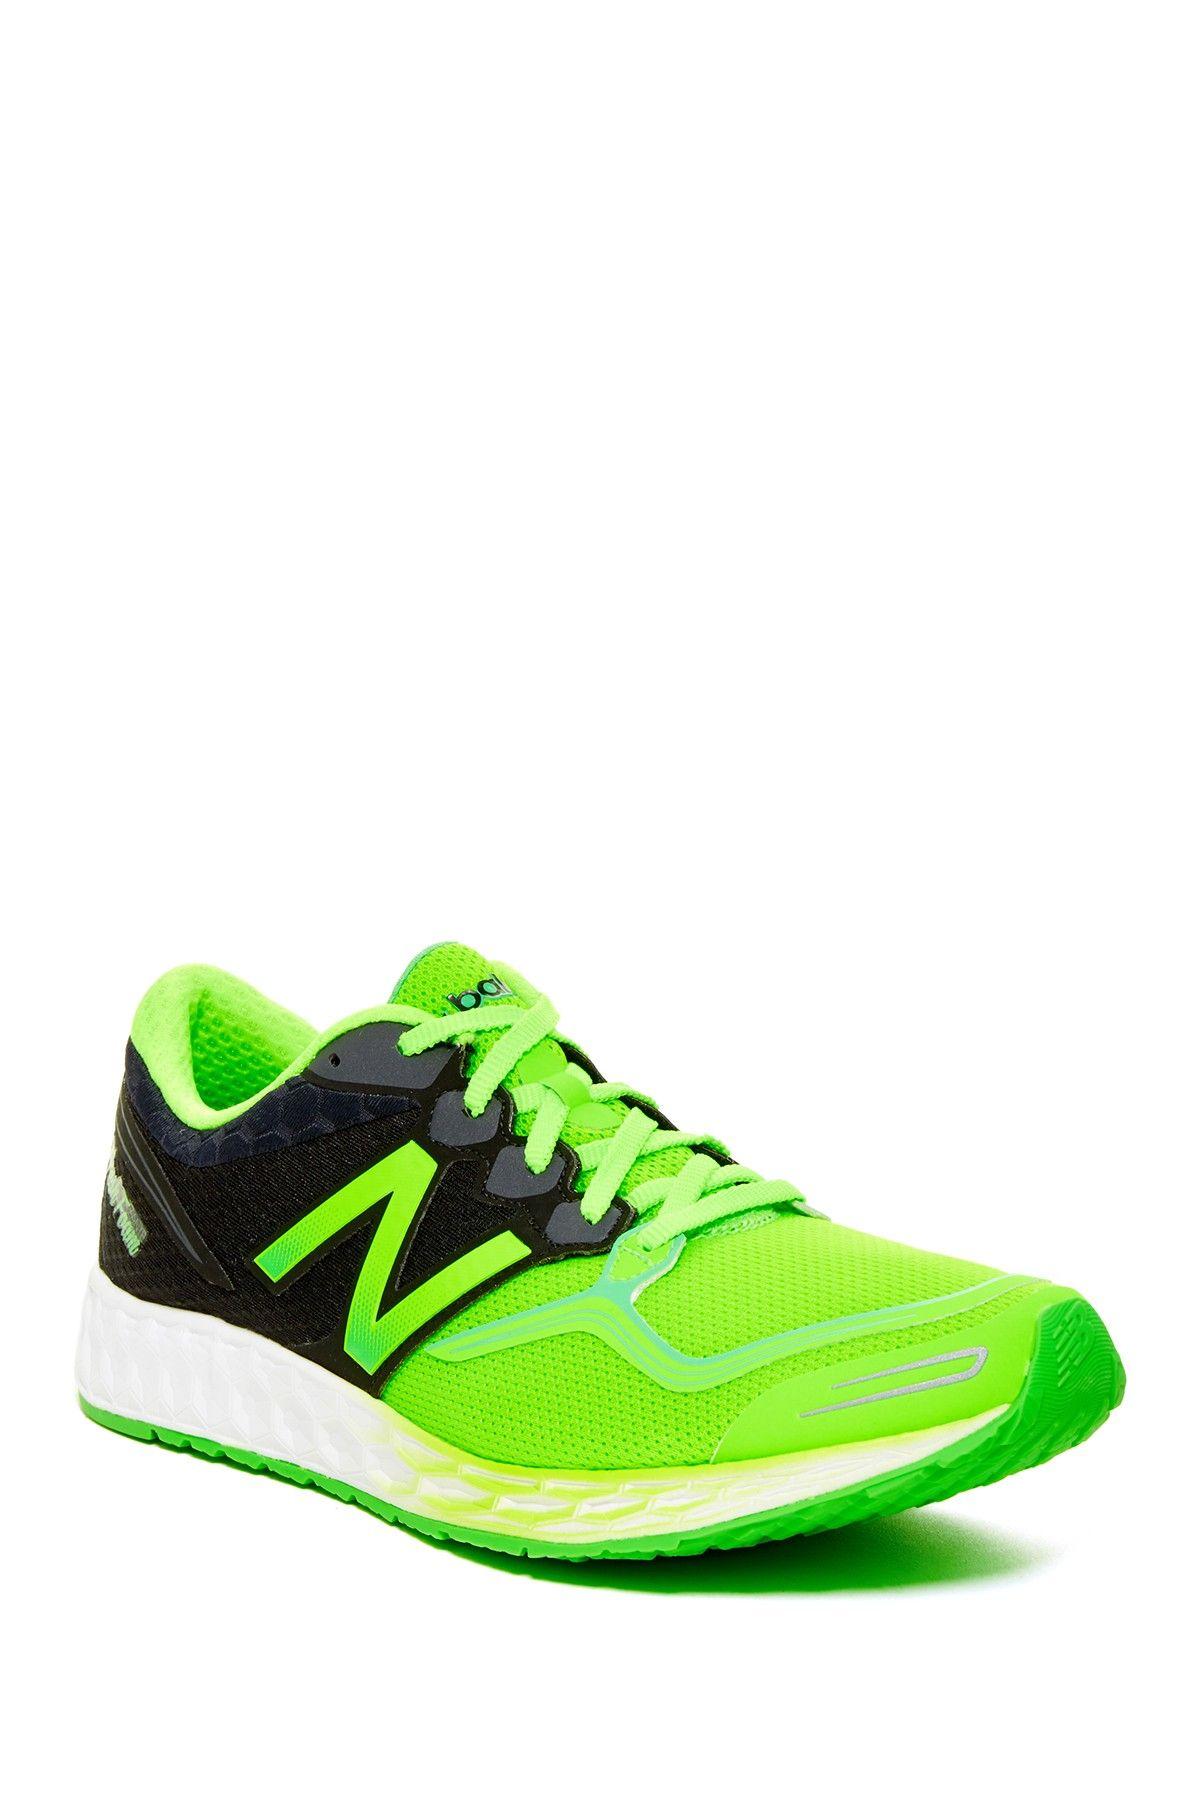 new balance 980 trainers